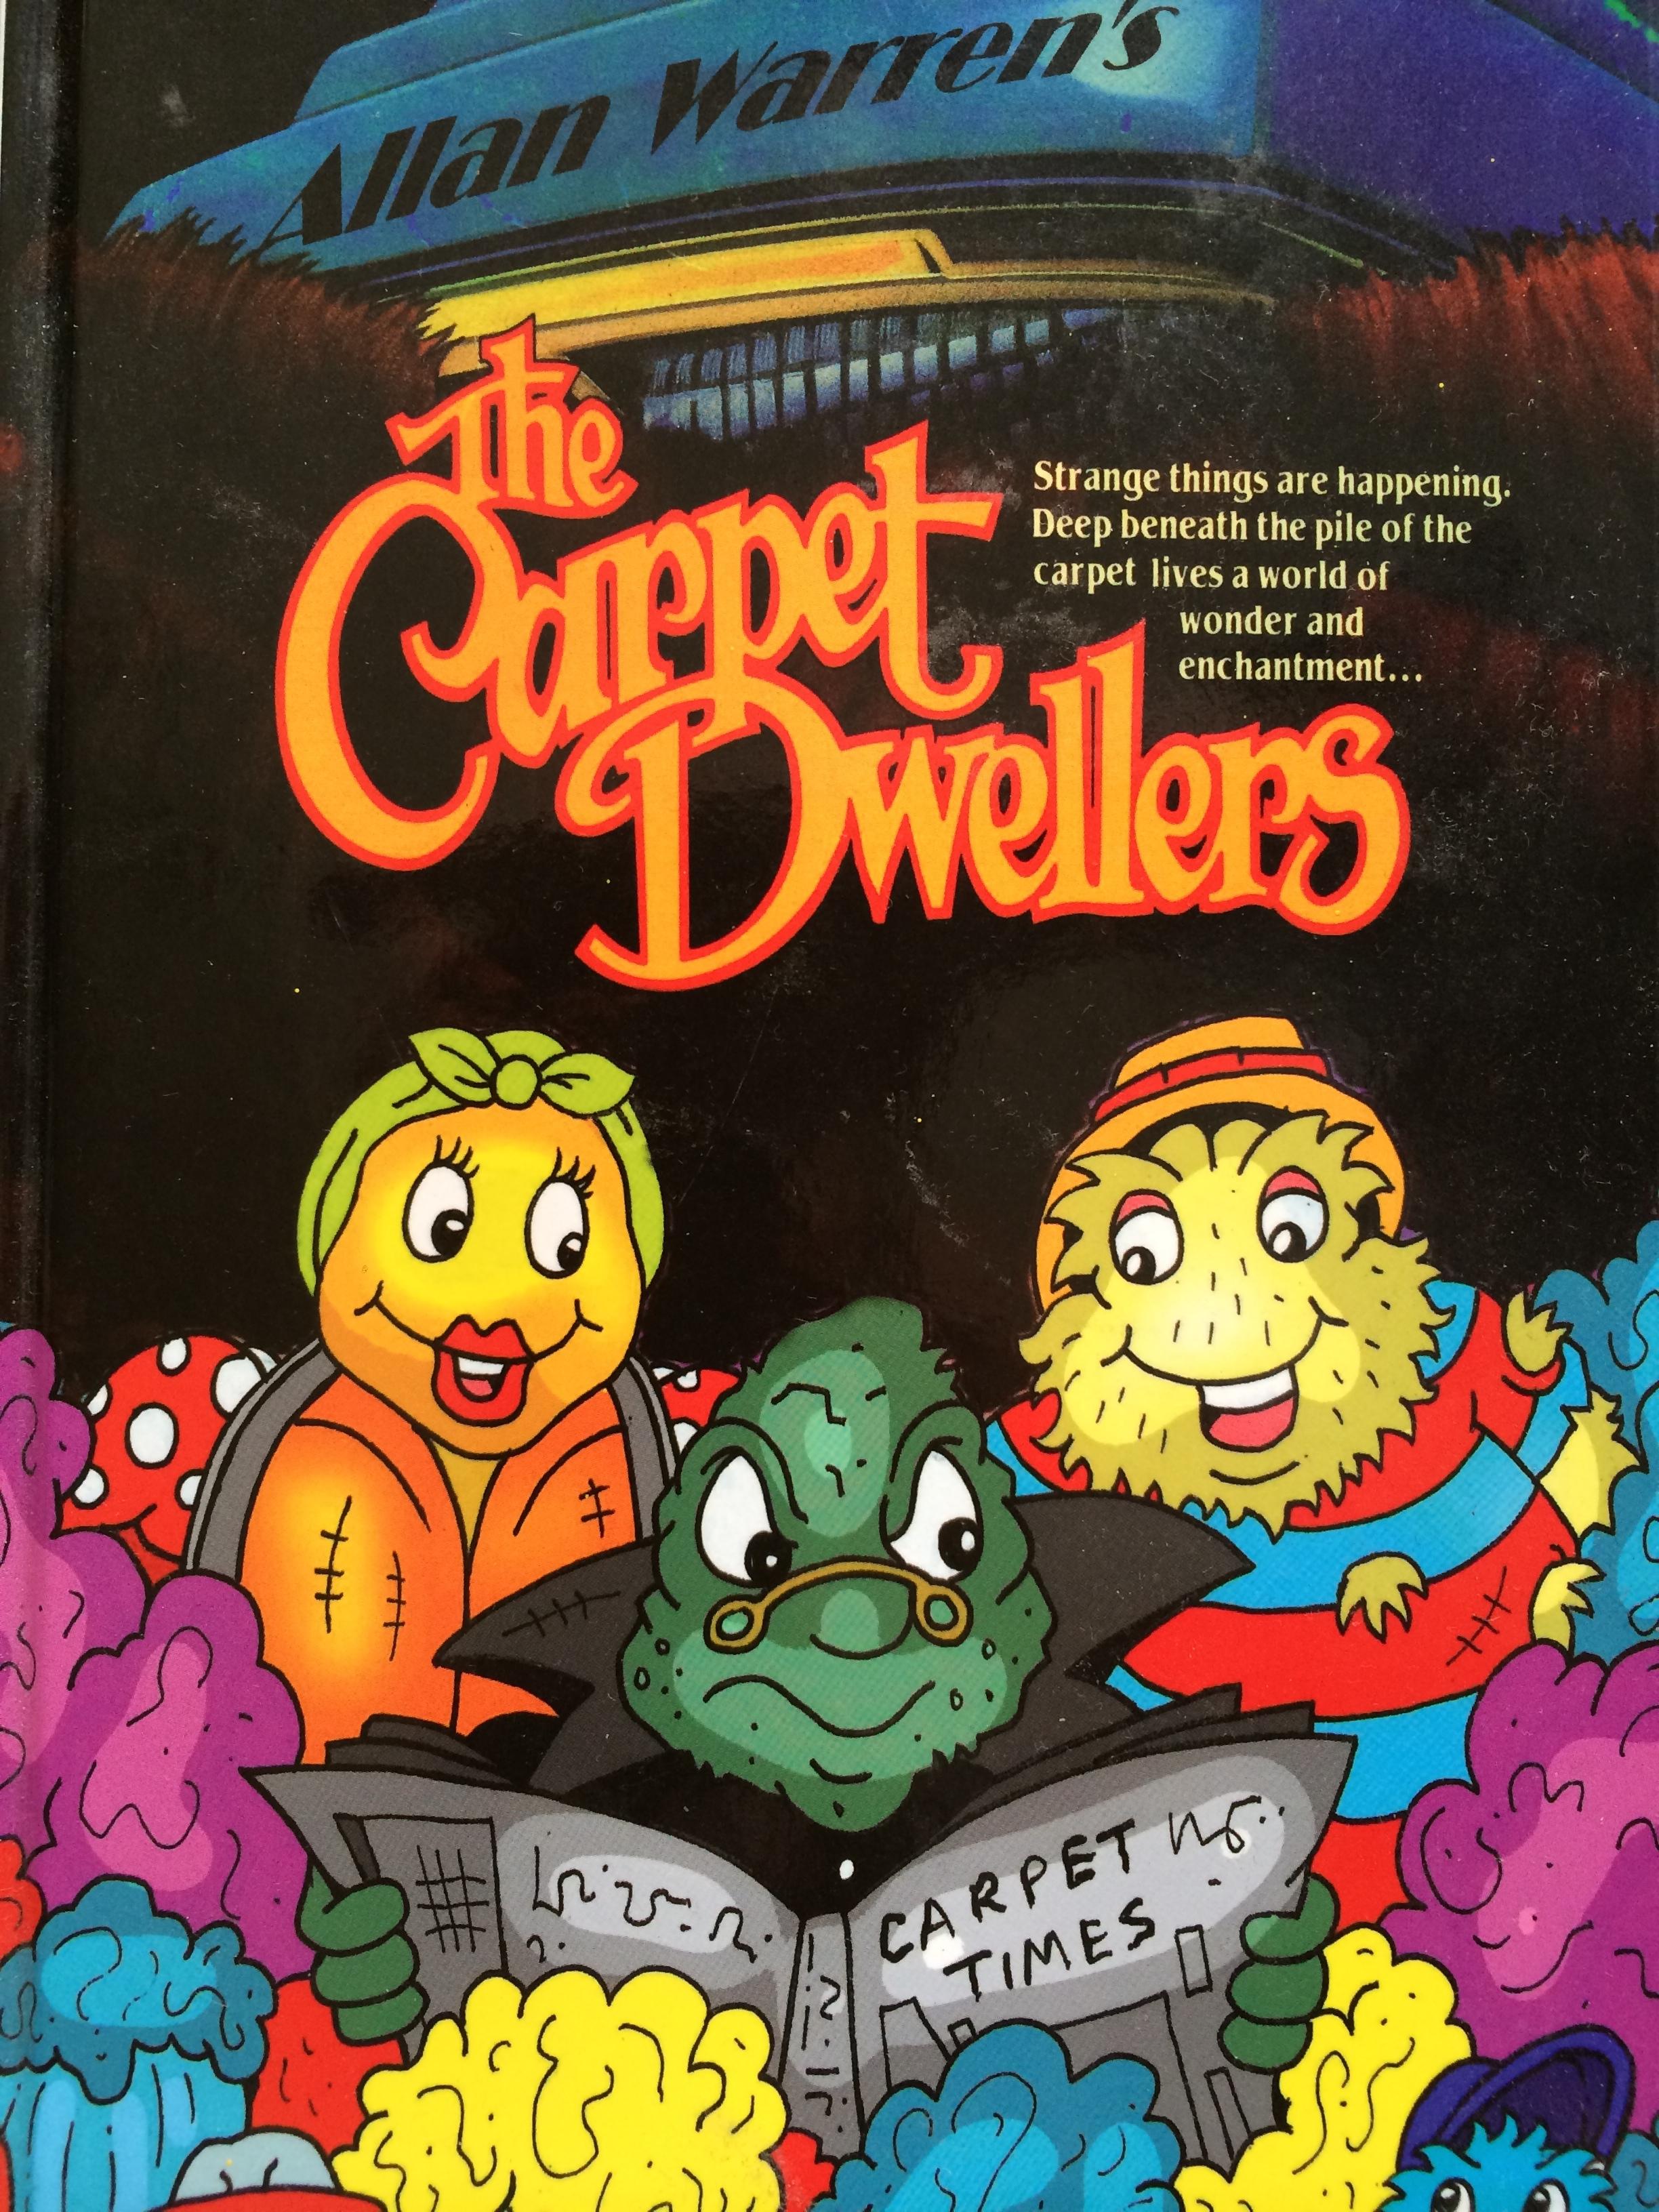 The Carpet Dwellers